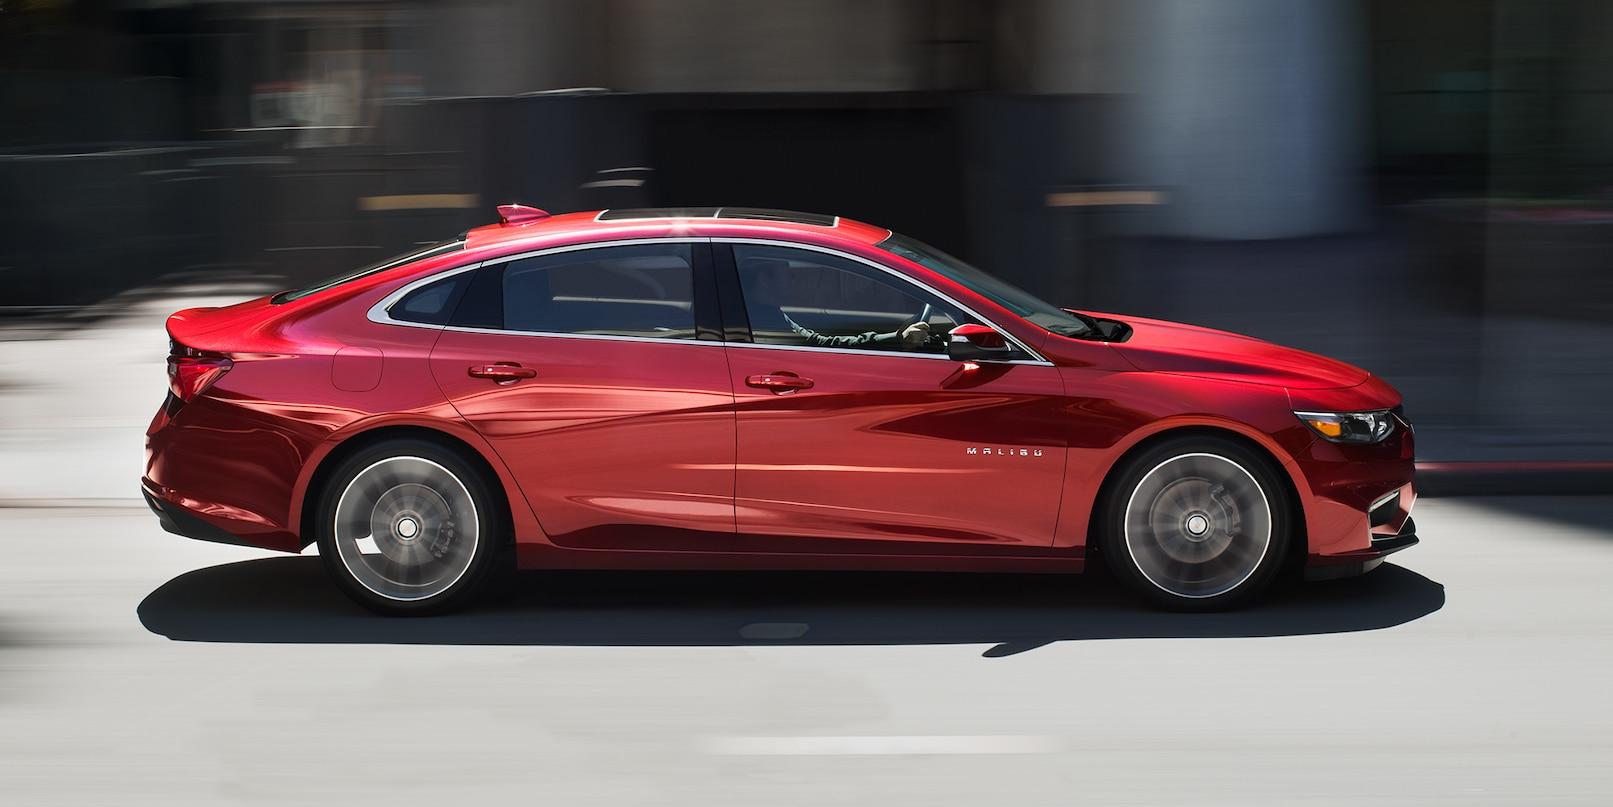 Chevrolet Malibu Financing In Oklahoma City OK David Stanley - Car show okc today